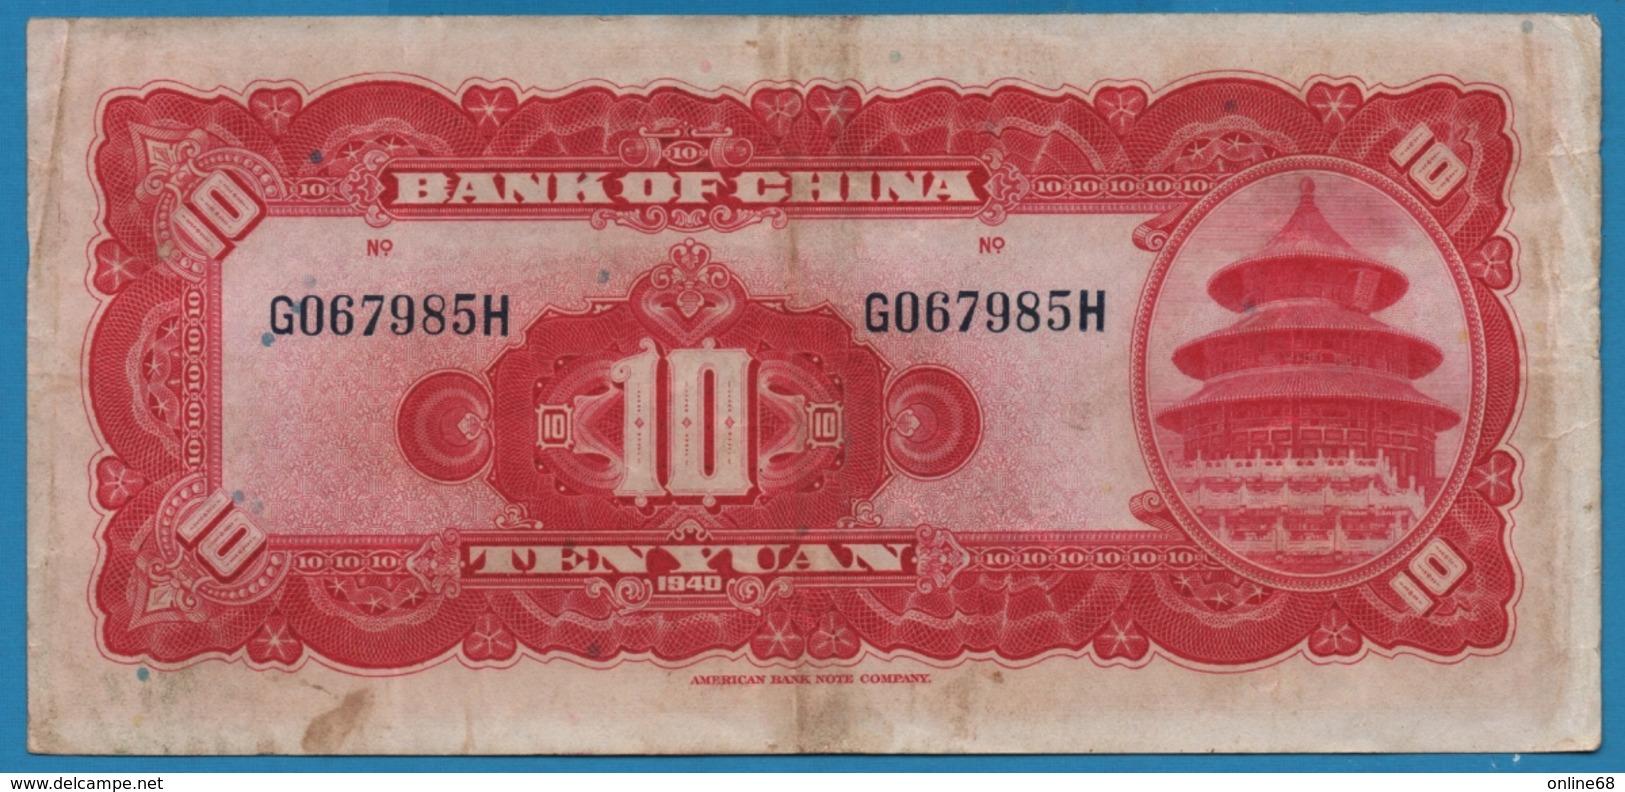 CHINA BANK OF 10 YUAN 1940 Serie G067985H  P# 85b Dr. Sun Yat-sen Temple Of Heaven - China